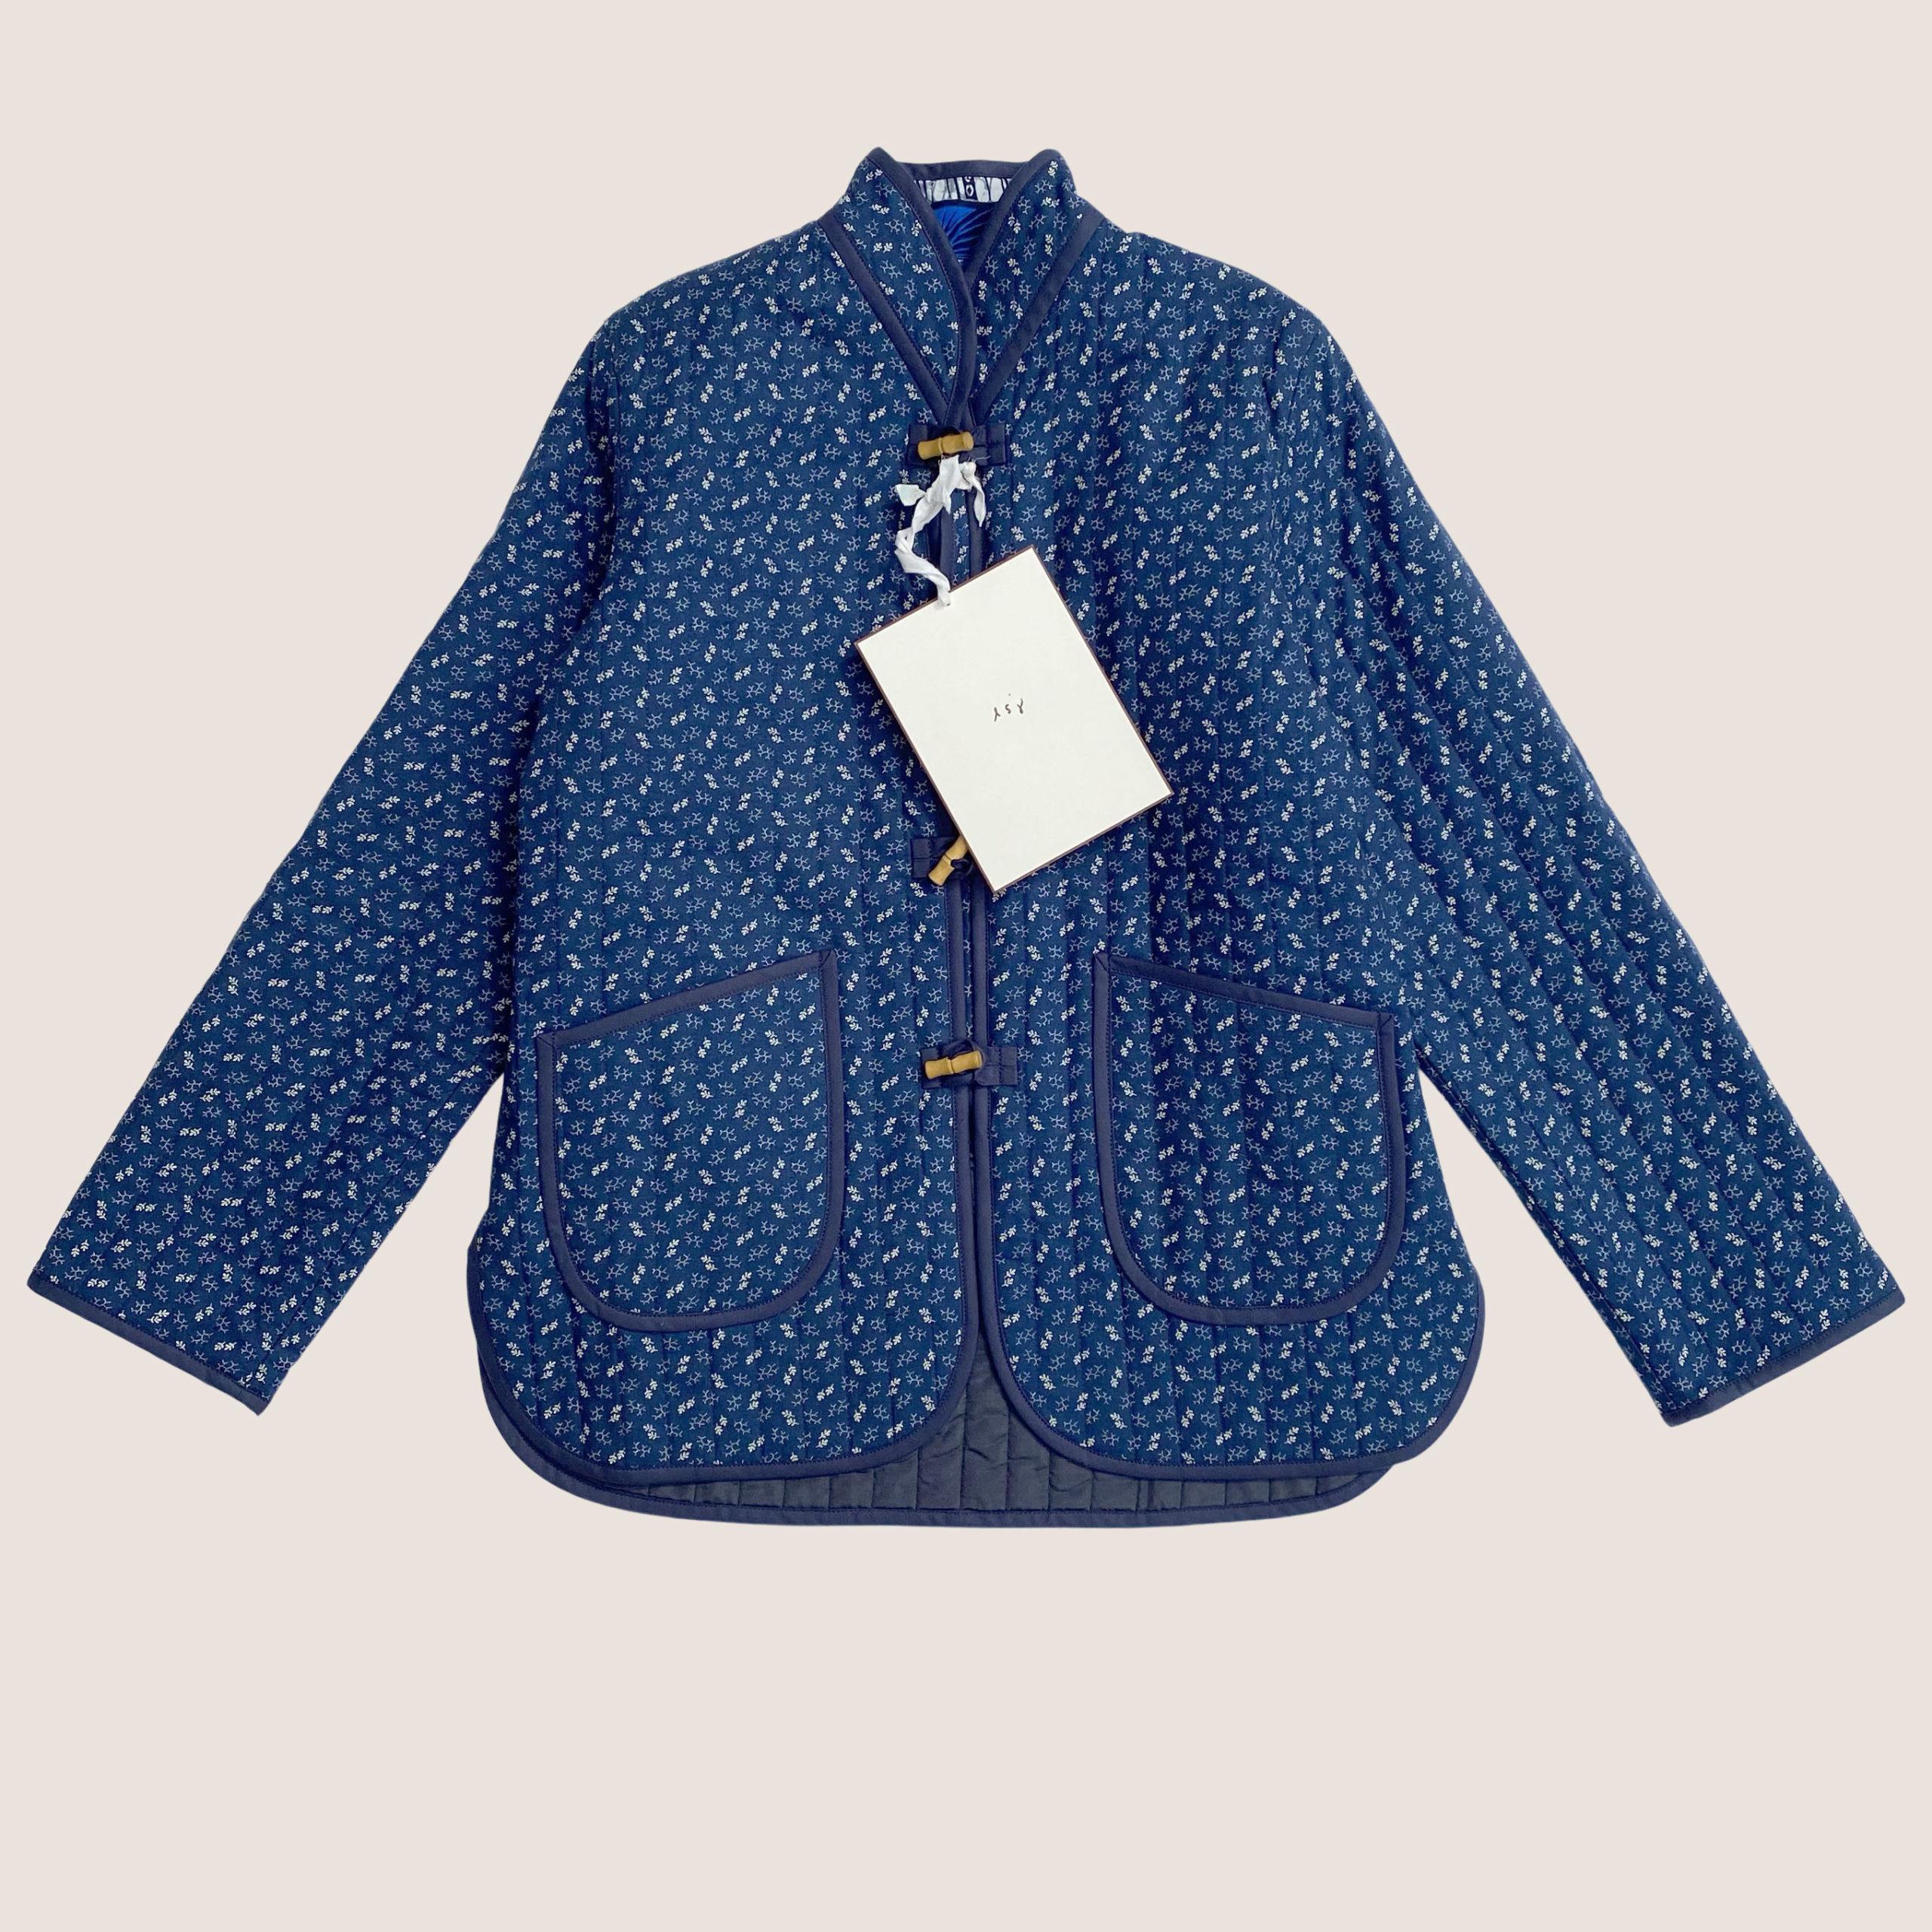 The Original Quilt Jacket - Calico